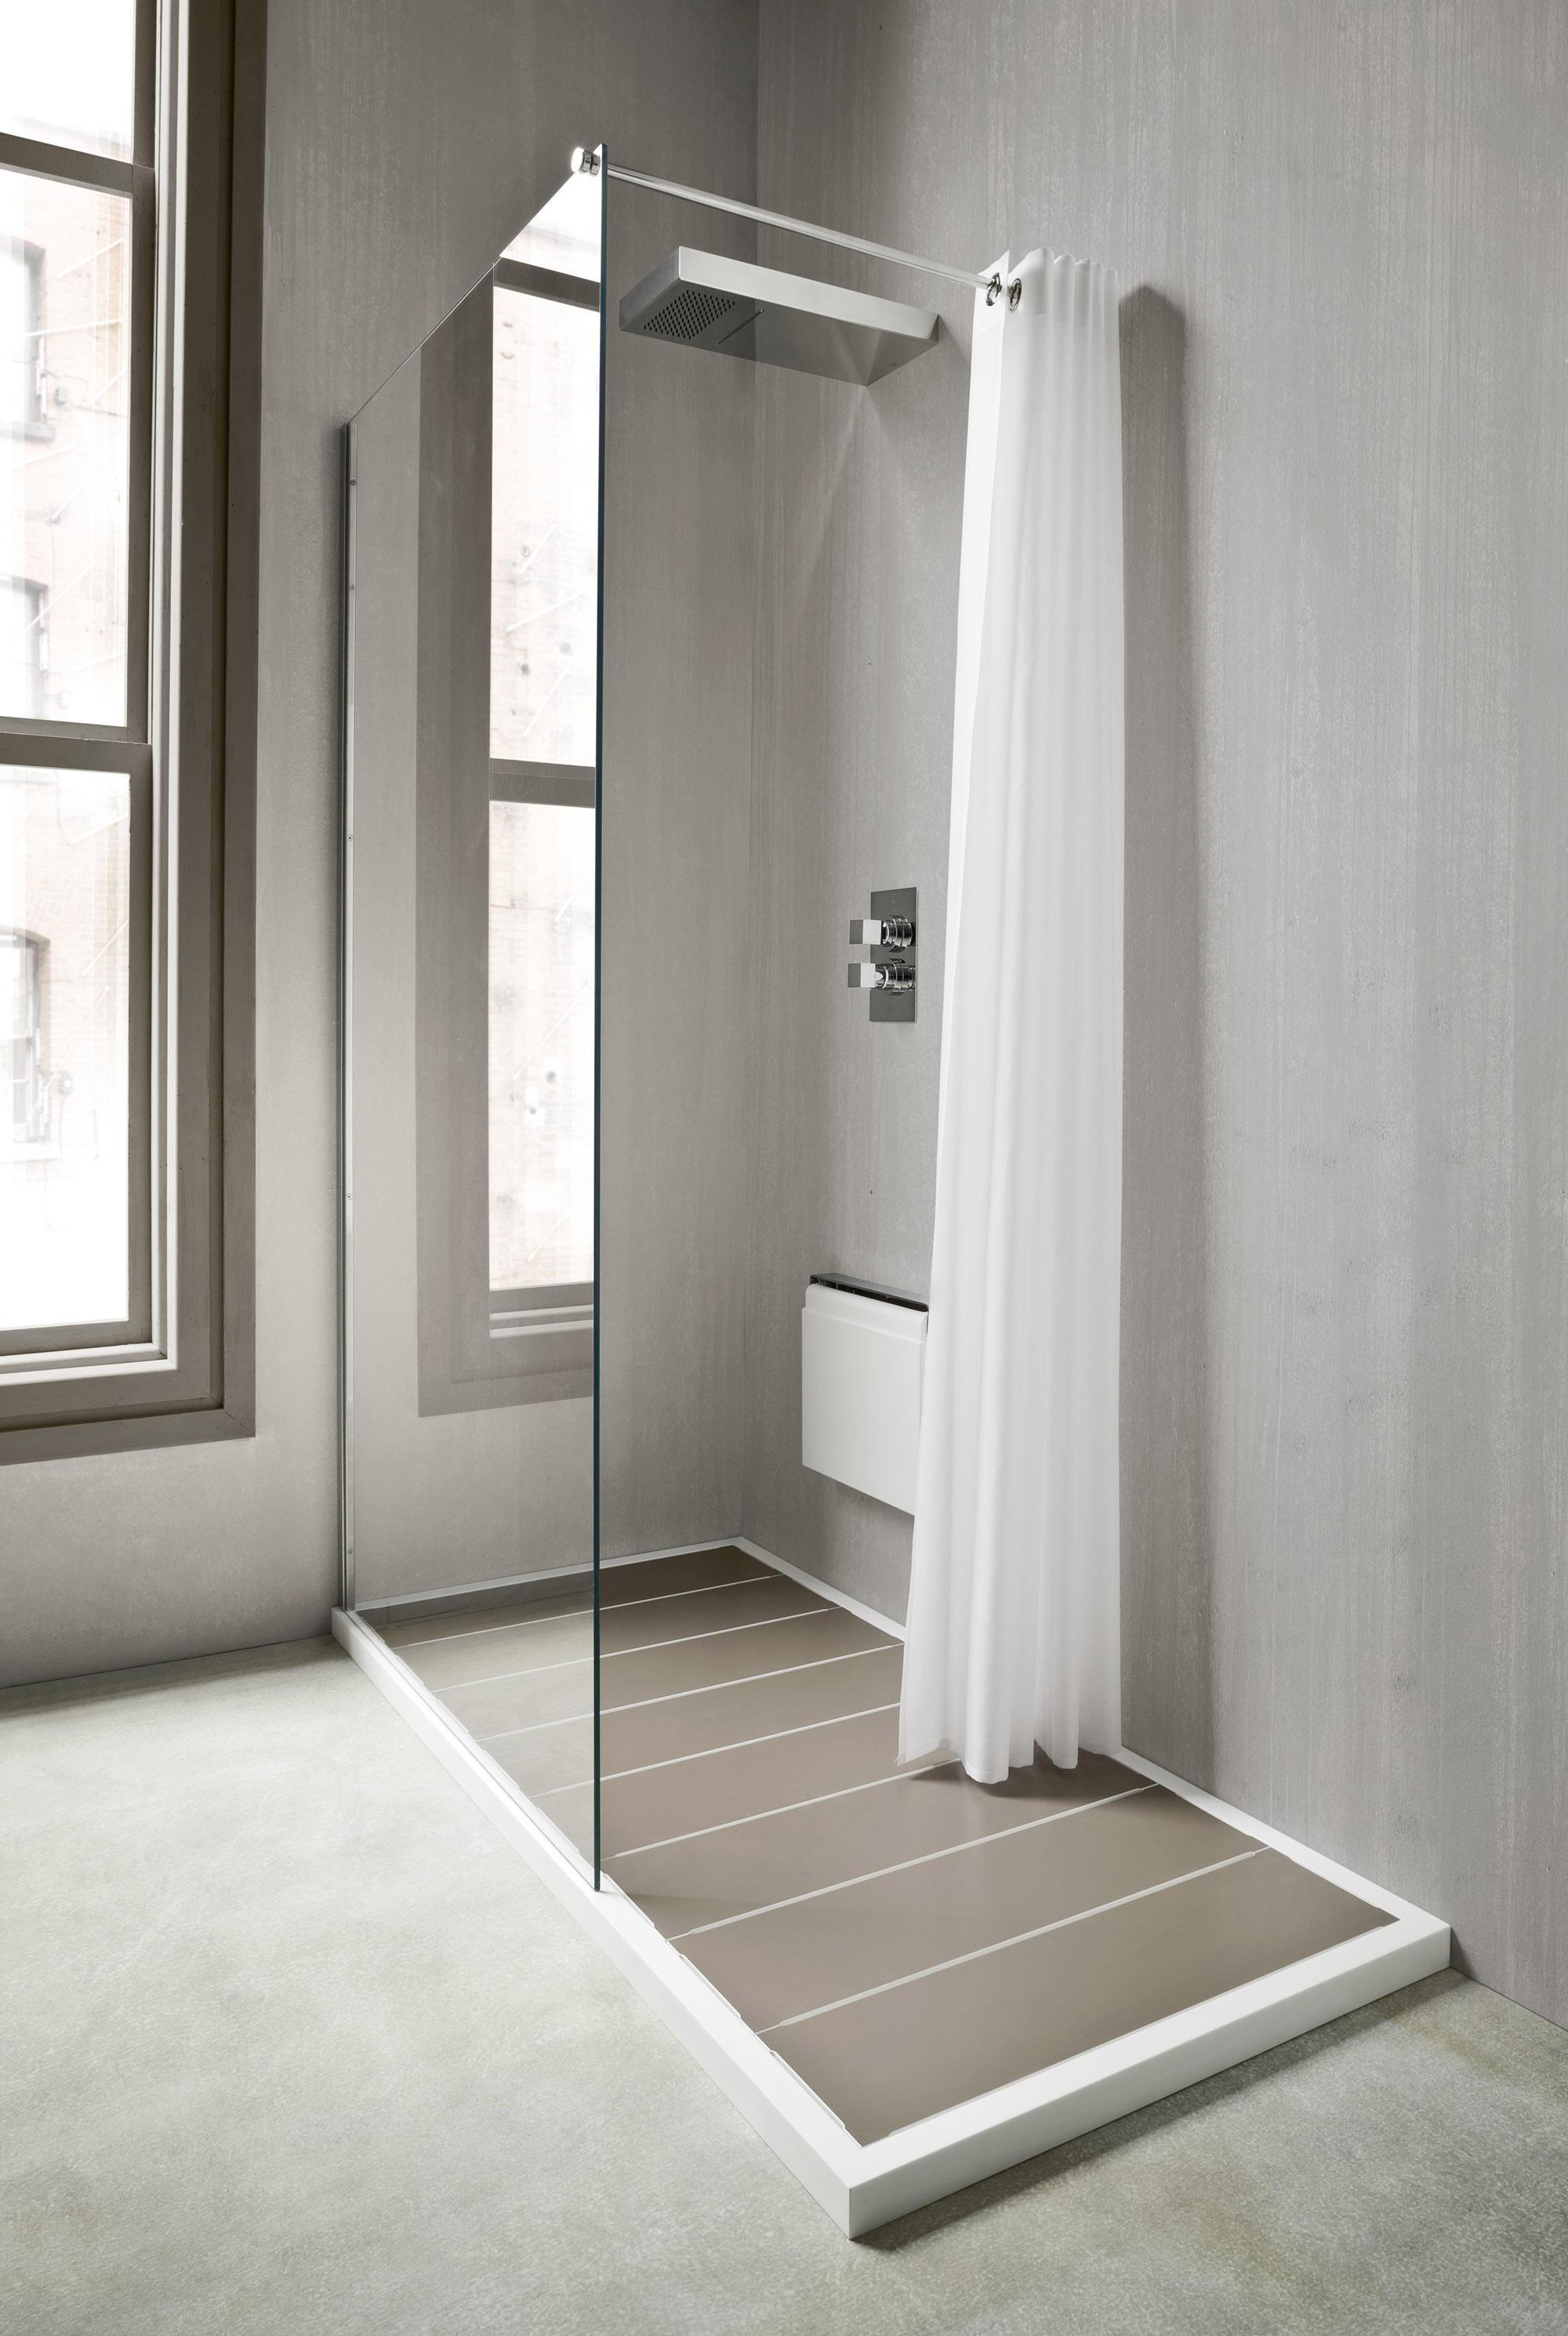 giano douche receveur et fermeture pare douches de rexa design architonic. Black Bedroom Furniture Sets. Home Design Ideas